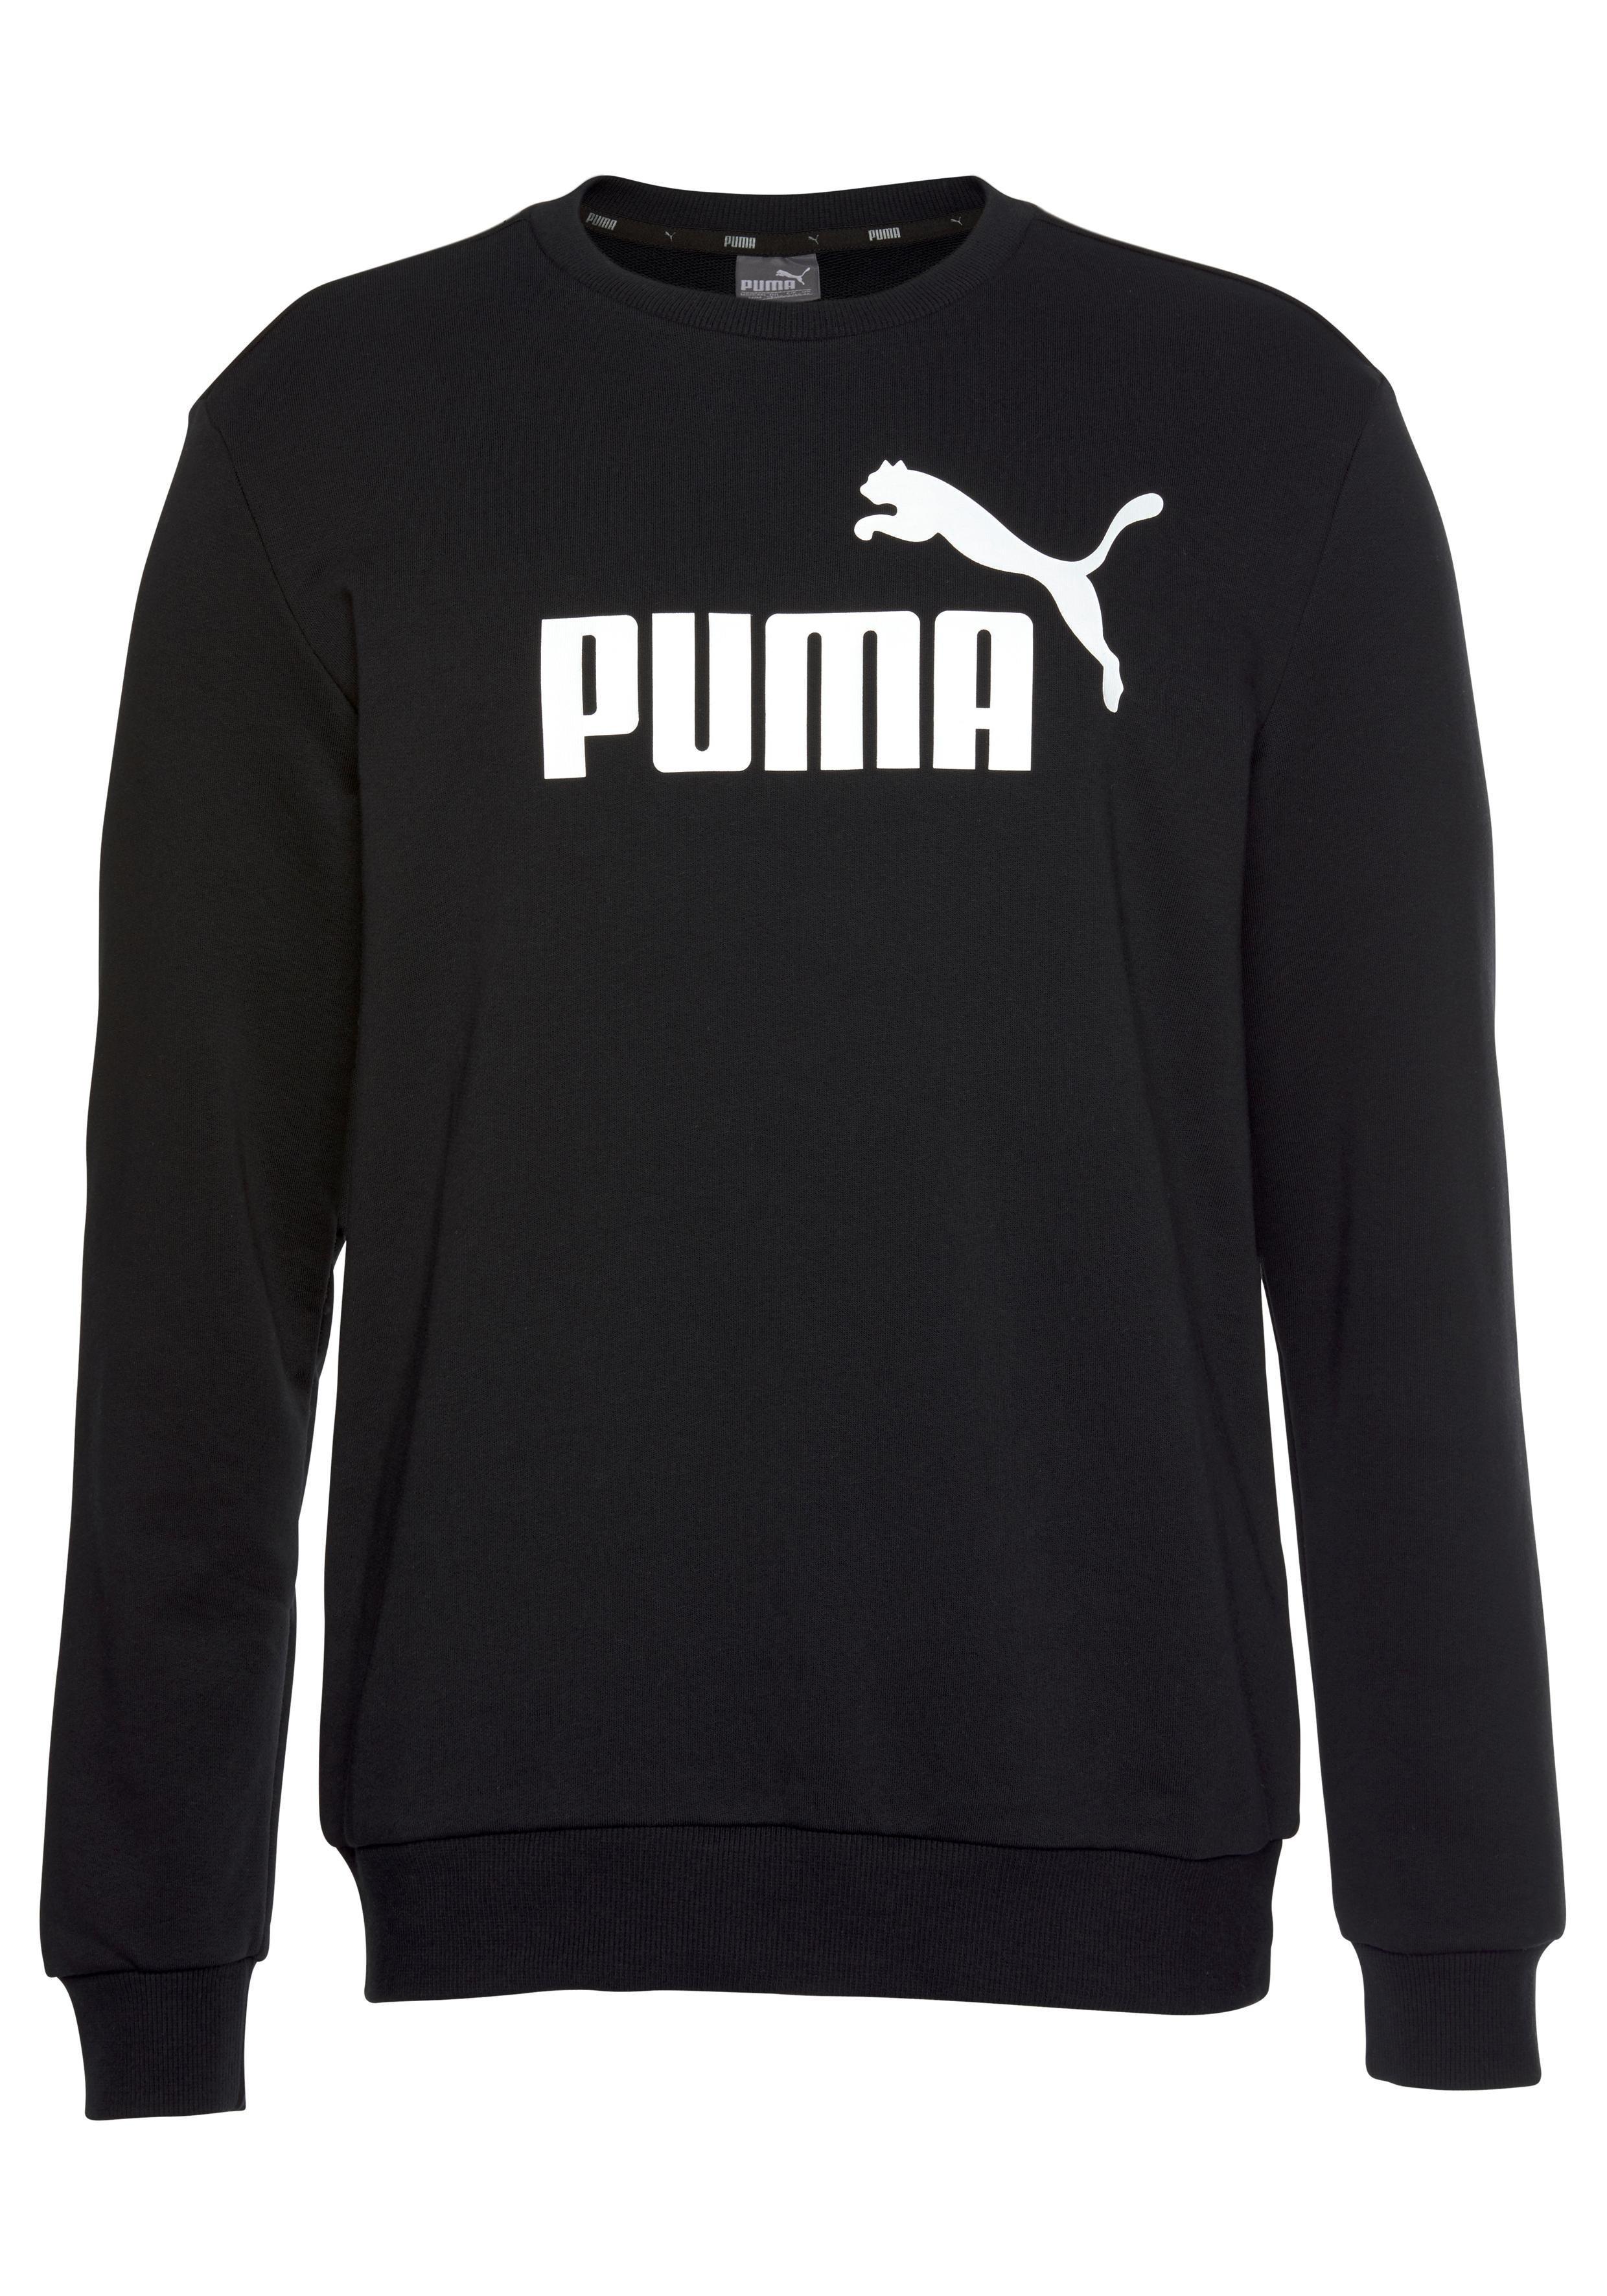 PUMA Sweatshirt »ESS LOGO CREW SWEAT TR BIG LOGO« | Bekleidung > Shirts > Sonstige Shirts | PUMA